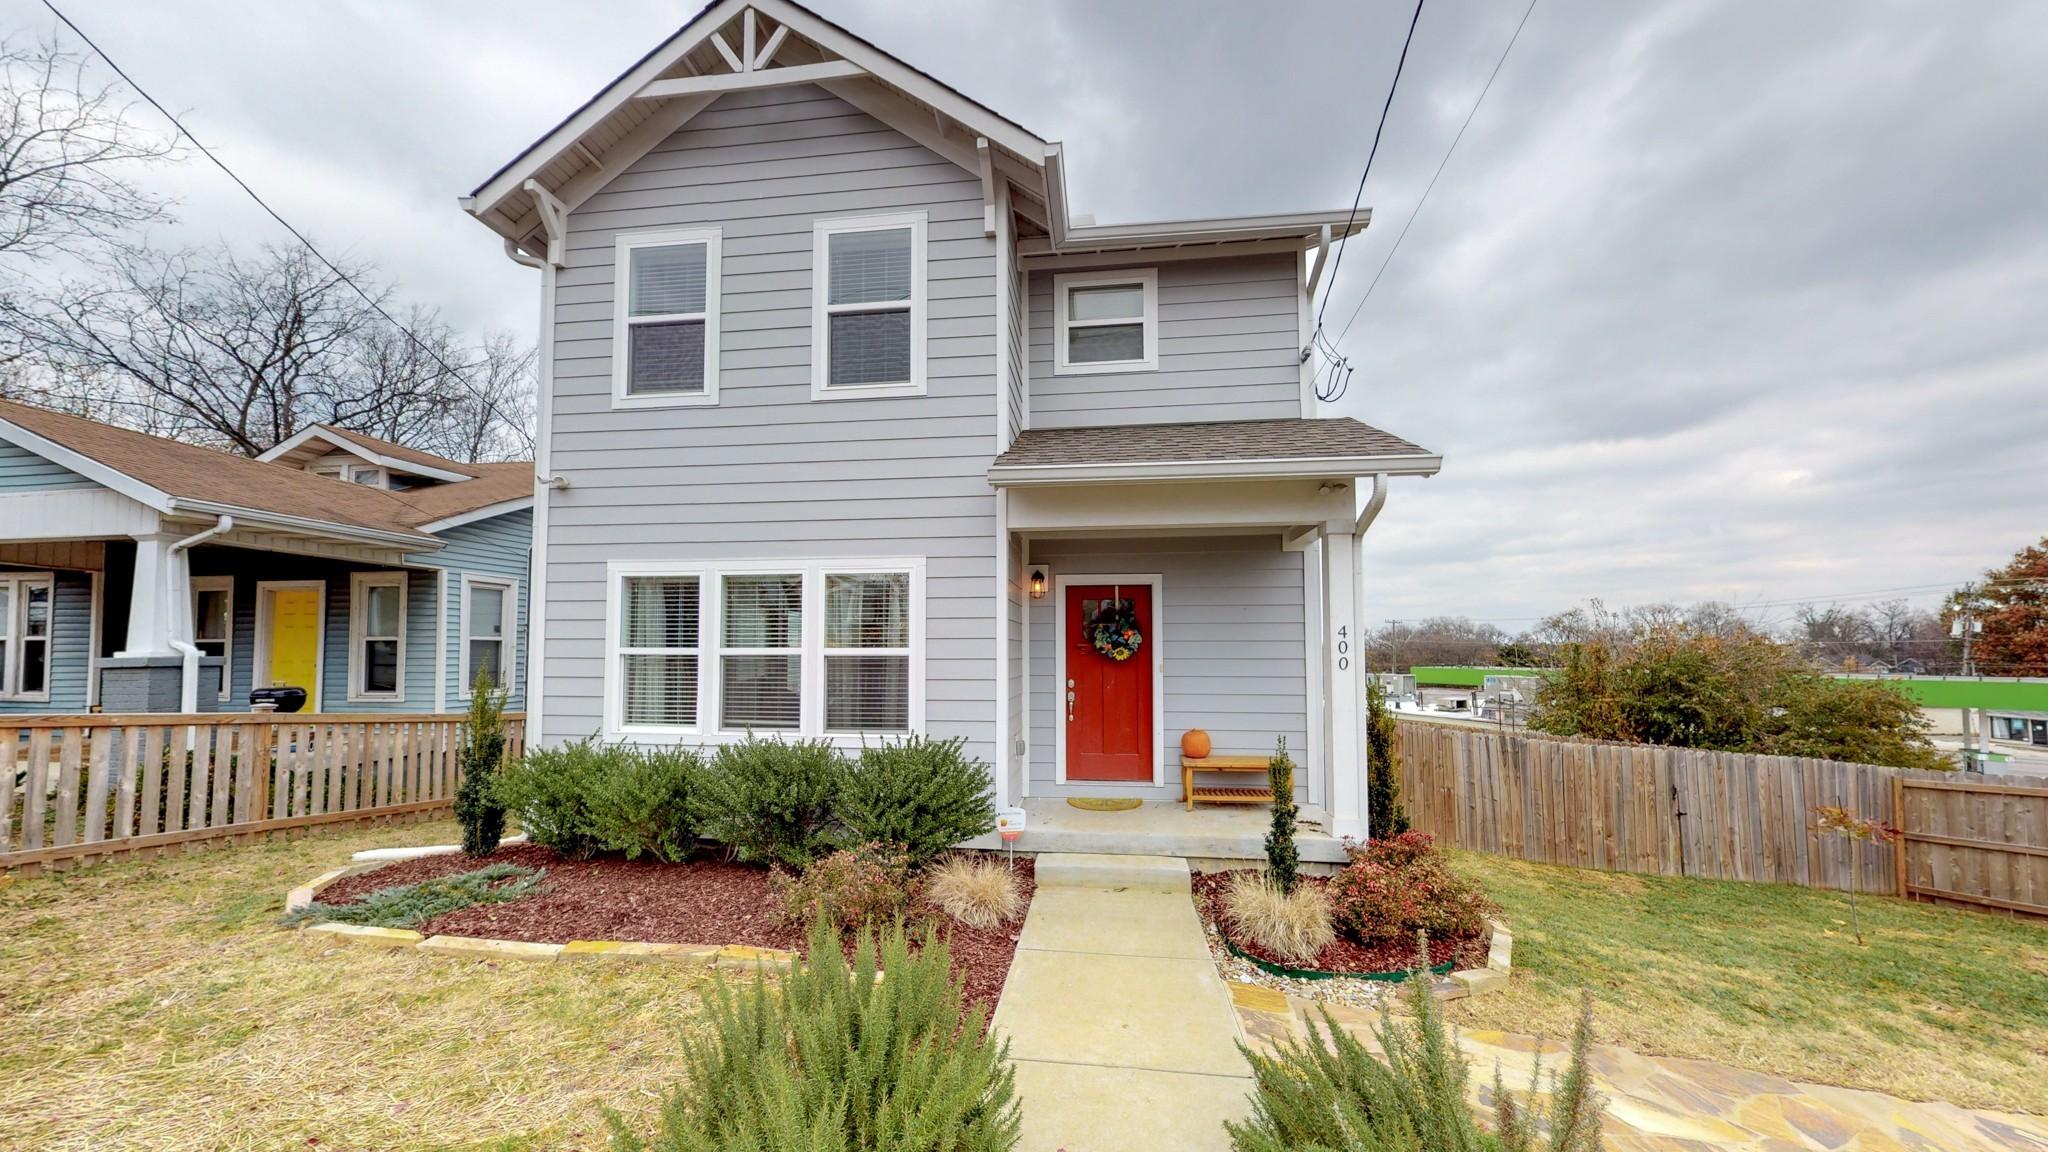 400 McIver St, Nashville, TN 37211 - Nashville, TN real estate listing